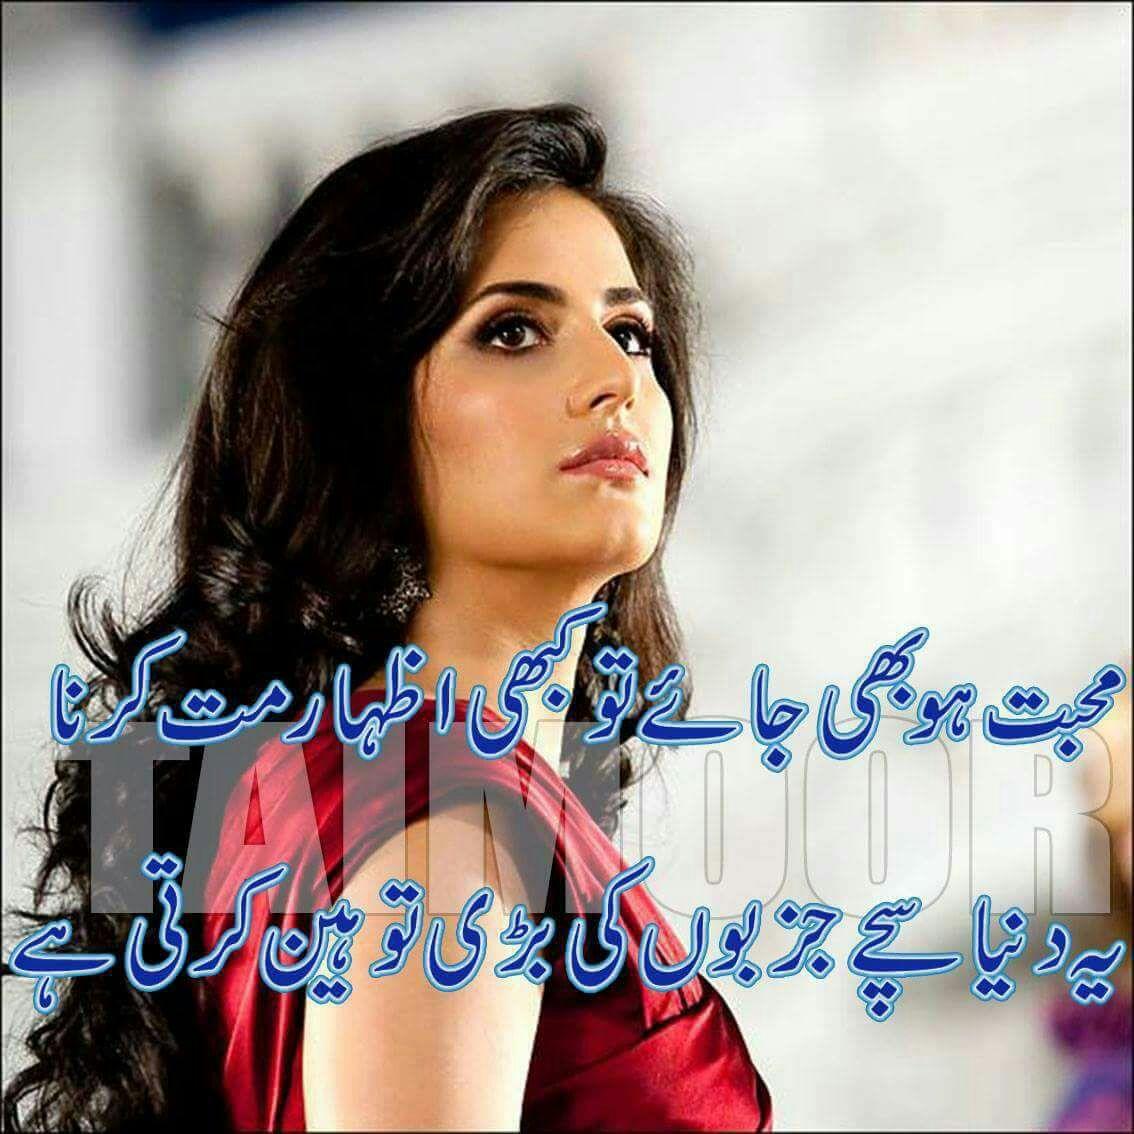 Mohabbat ho bi jay to kabhi Izhar | Urdu 2 Lines Sad Poetry Pic | Sad Shayri Images Poetry - Urdu Poetry World